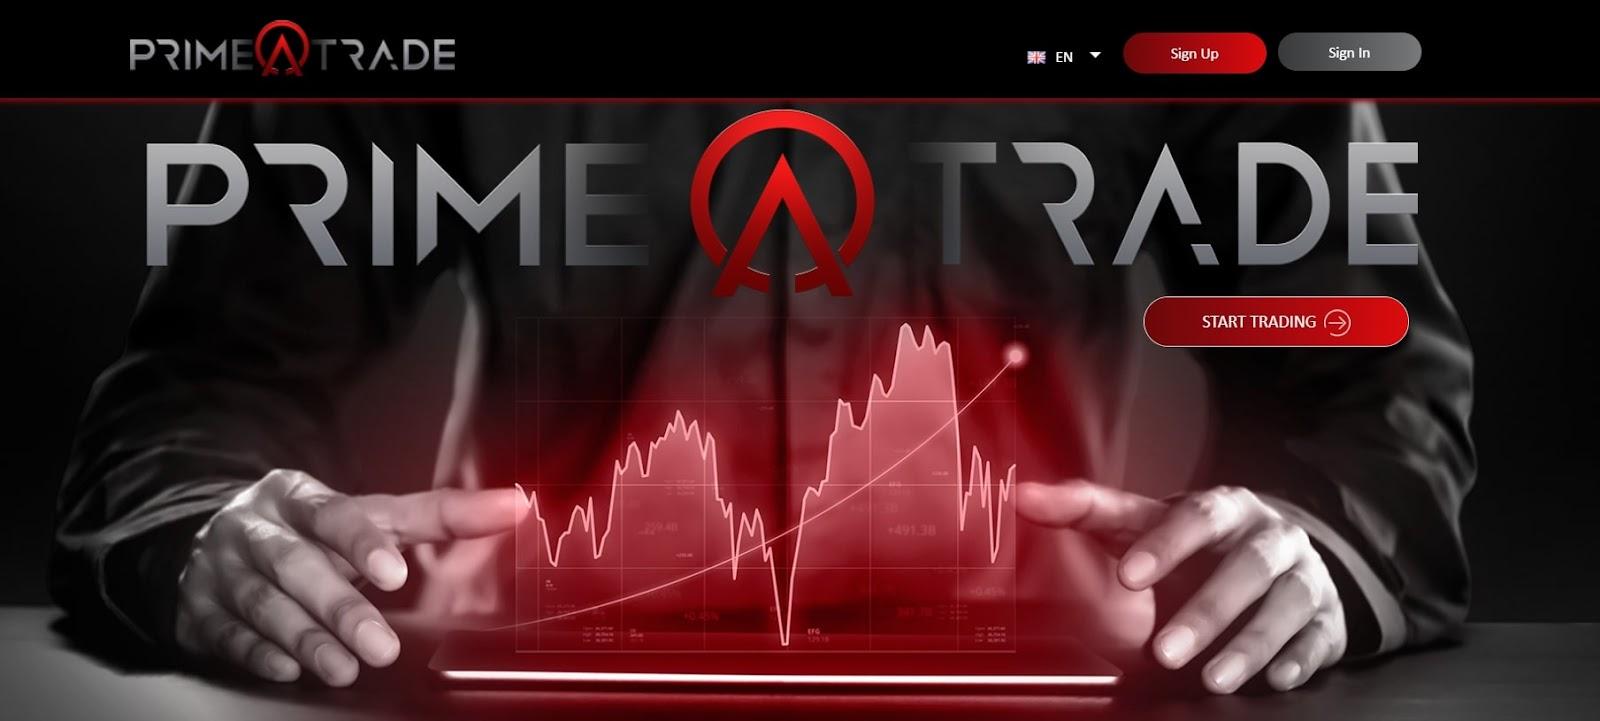 Prime A Trade отзывы клиентов и анализ деятельности